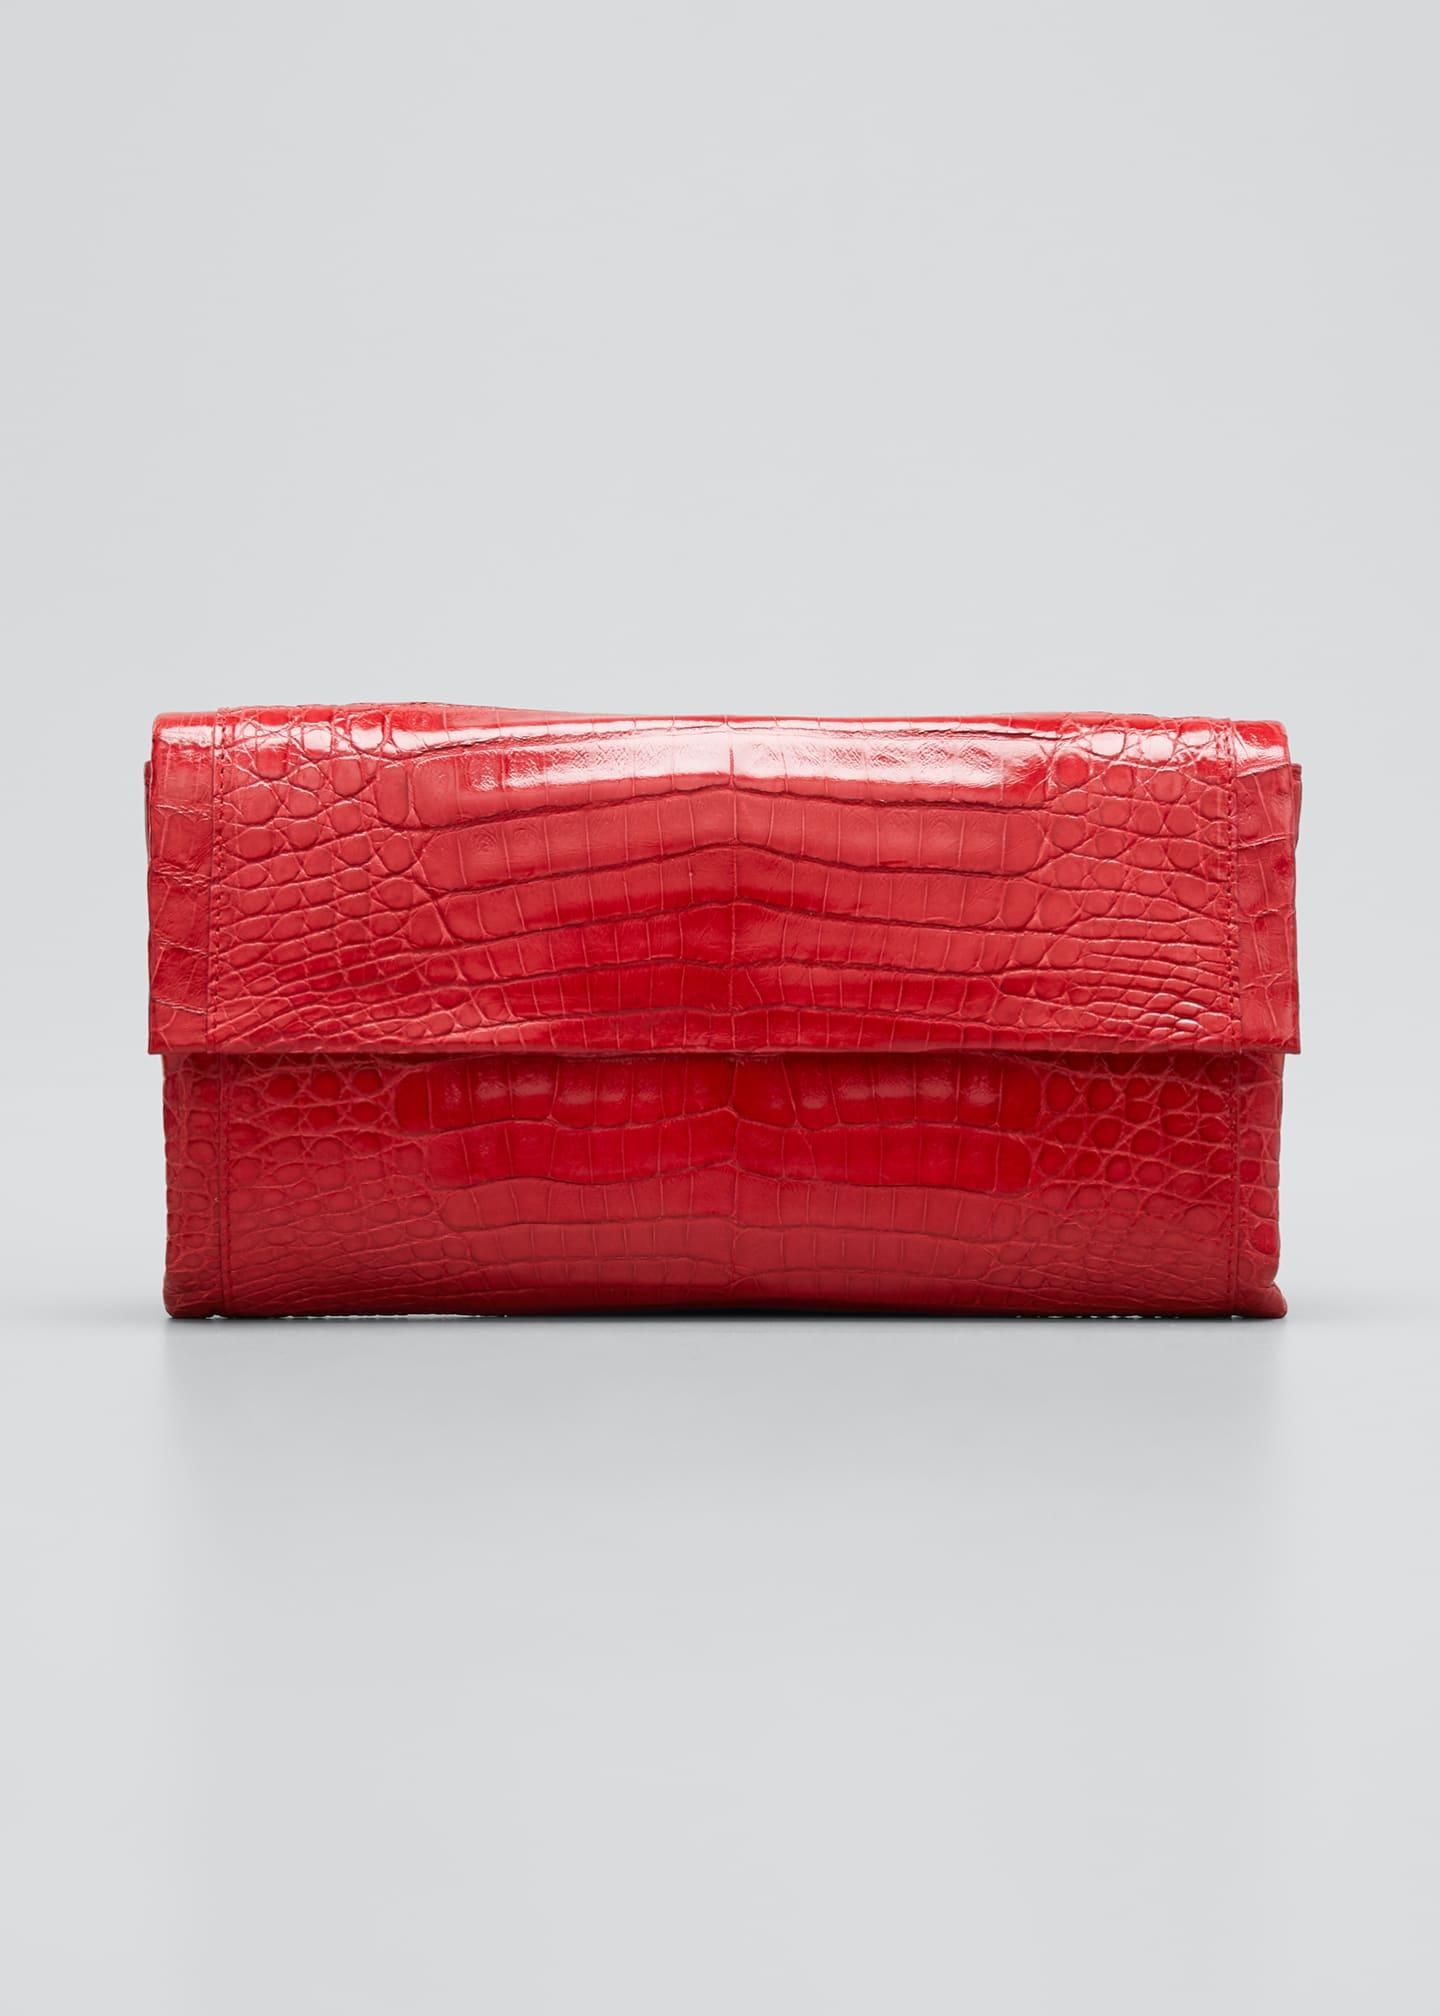 Nancy Gonzalez Simple Flap Crocodile Clutch Bag